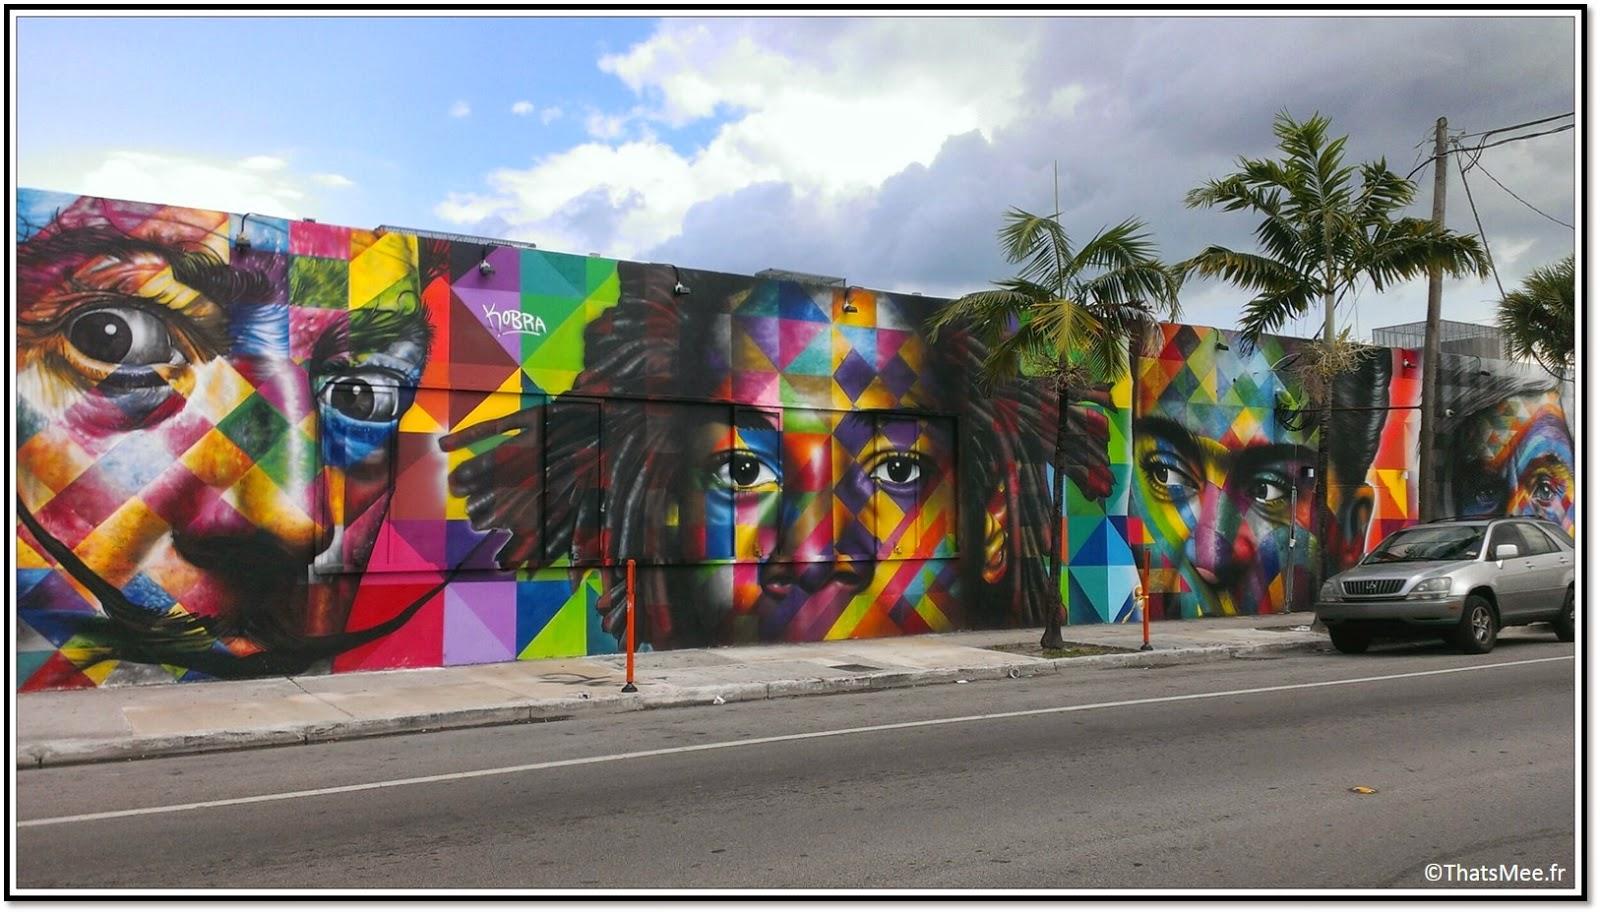 Miami midtown Wynwood District Street Art galleries NW 2nd Avenue  Dali Basquia Andy Warhol